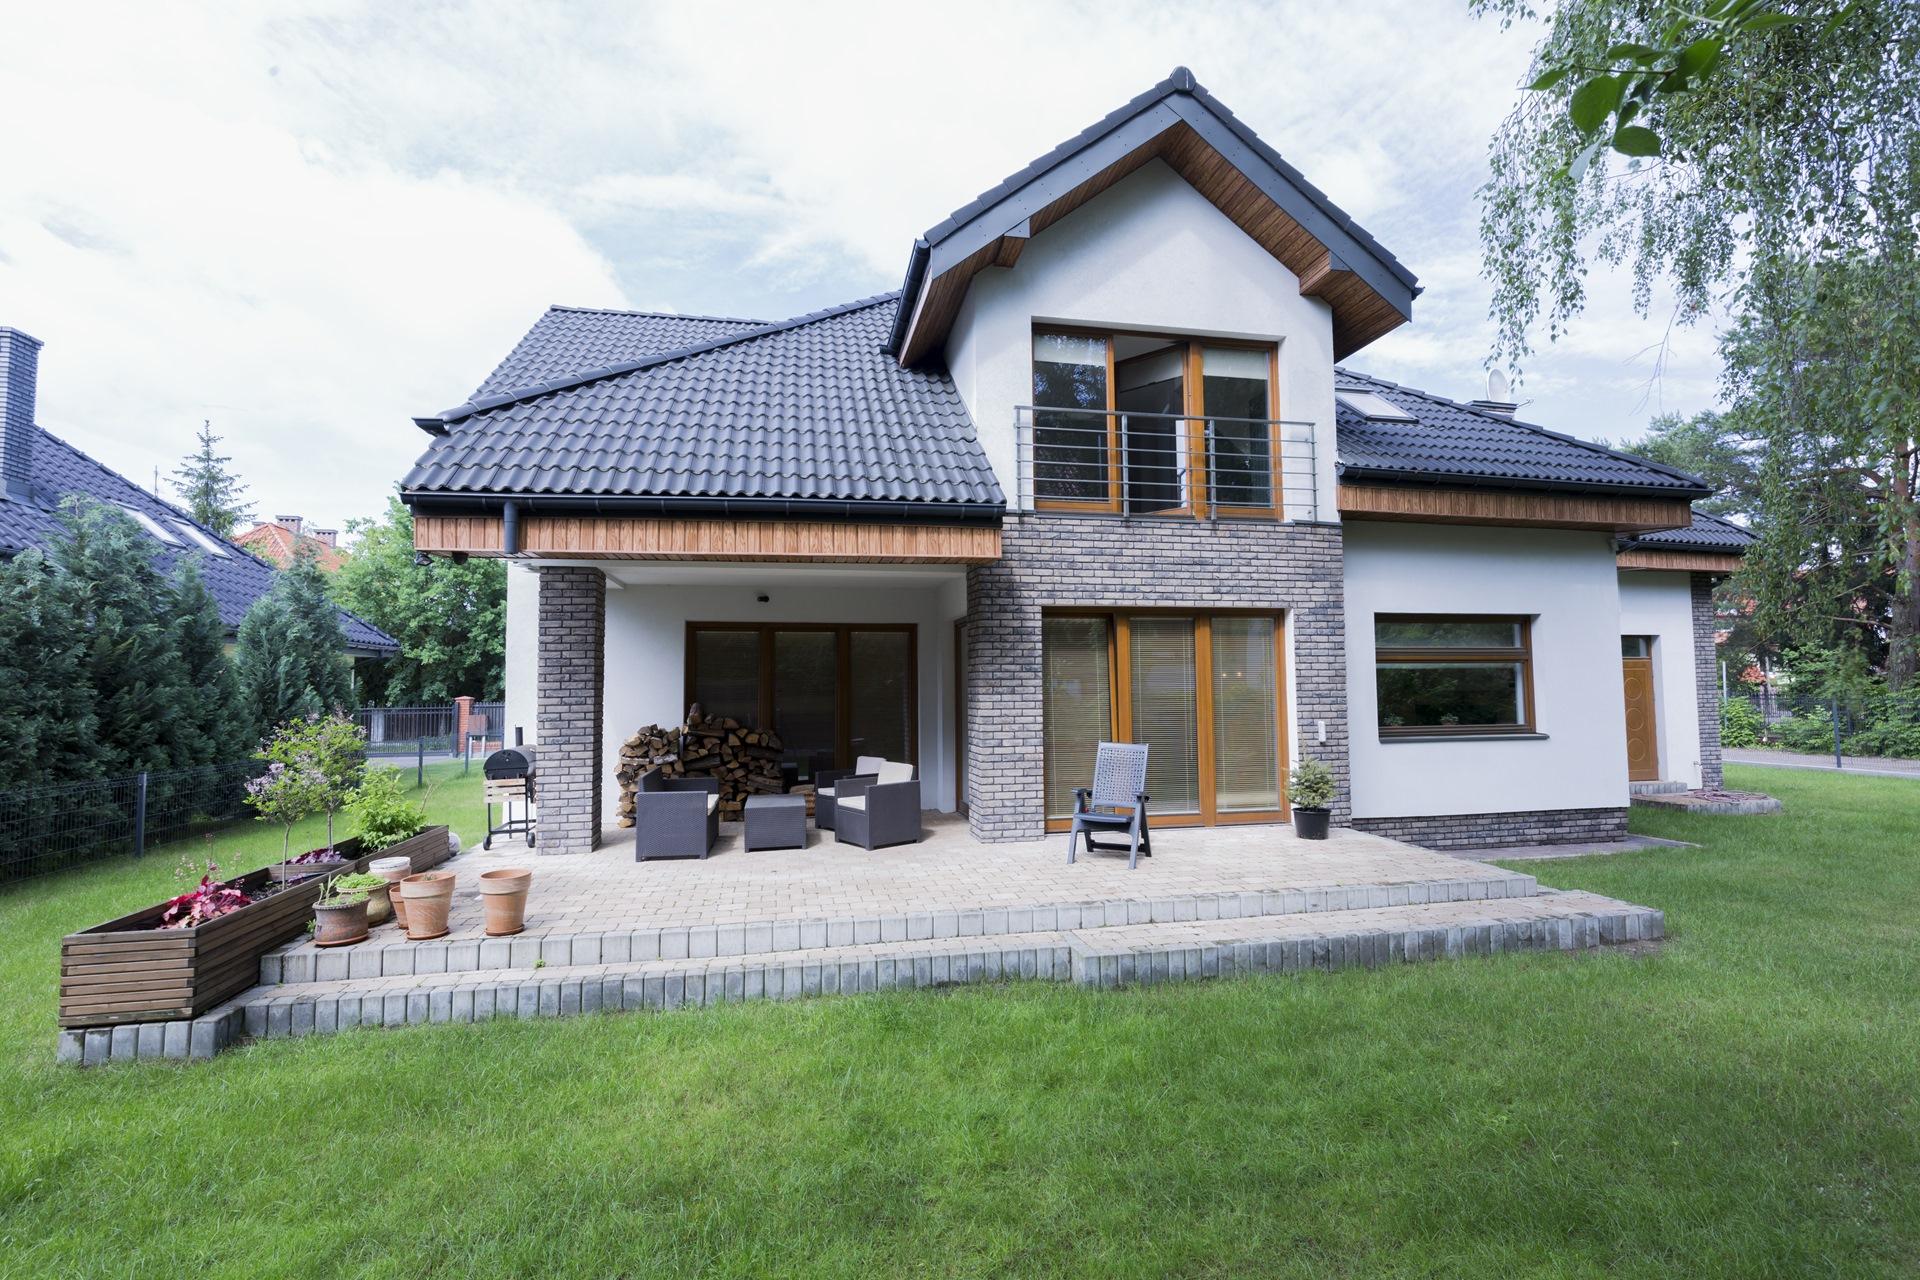 Home extension exterior